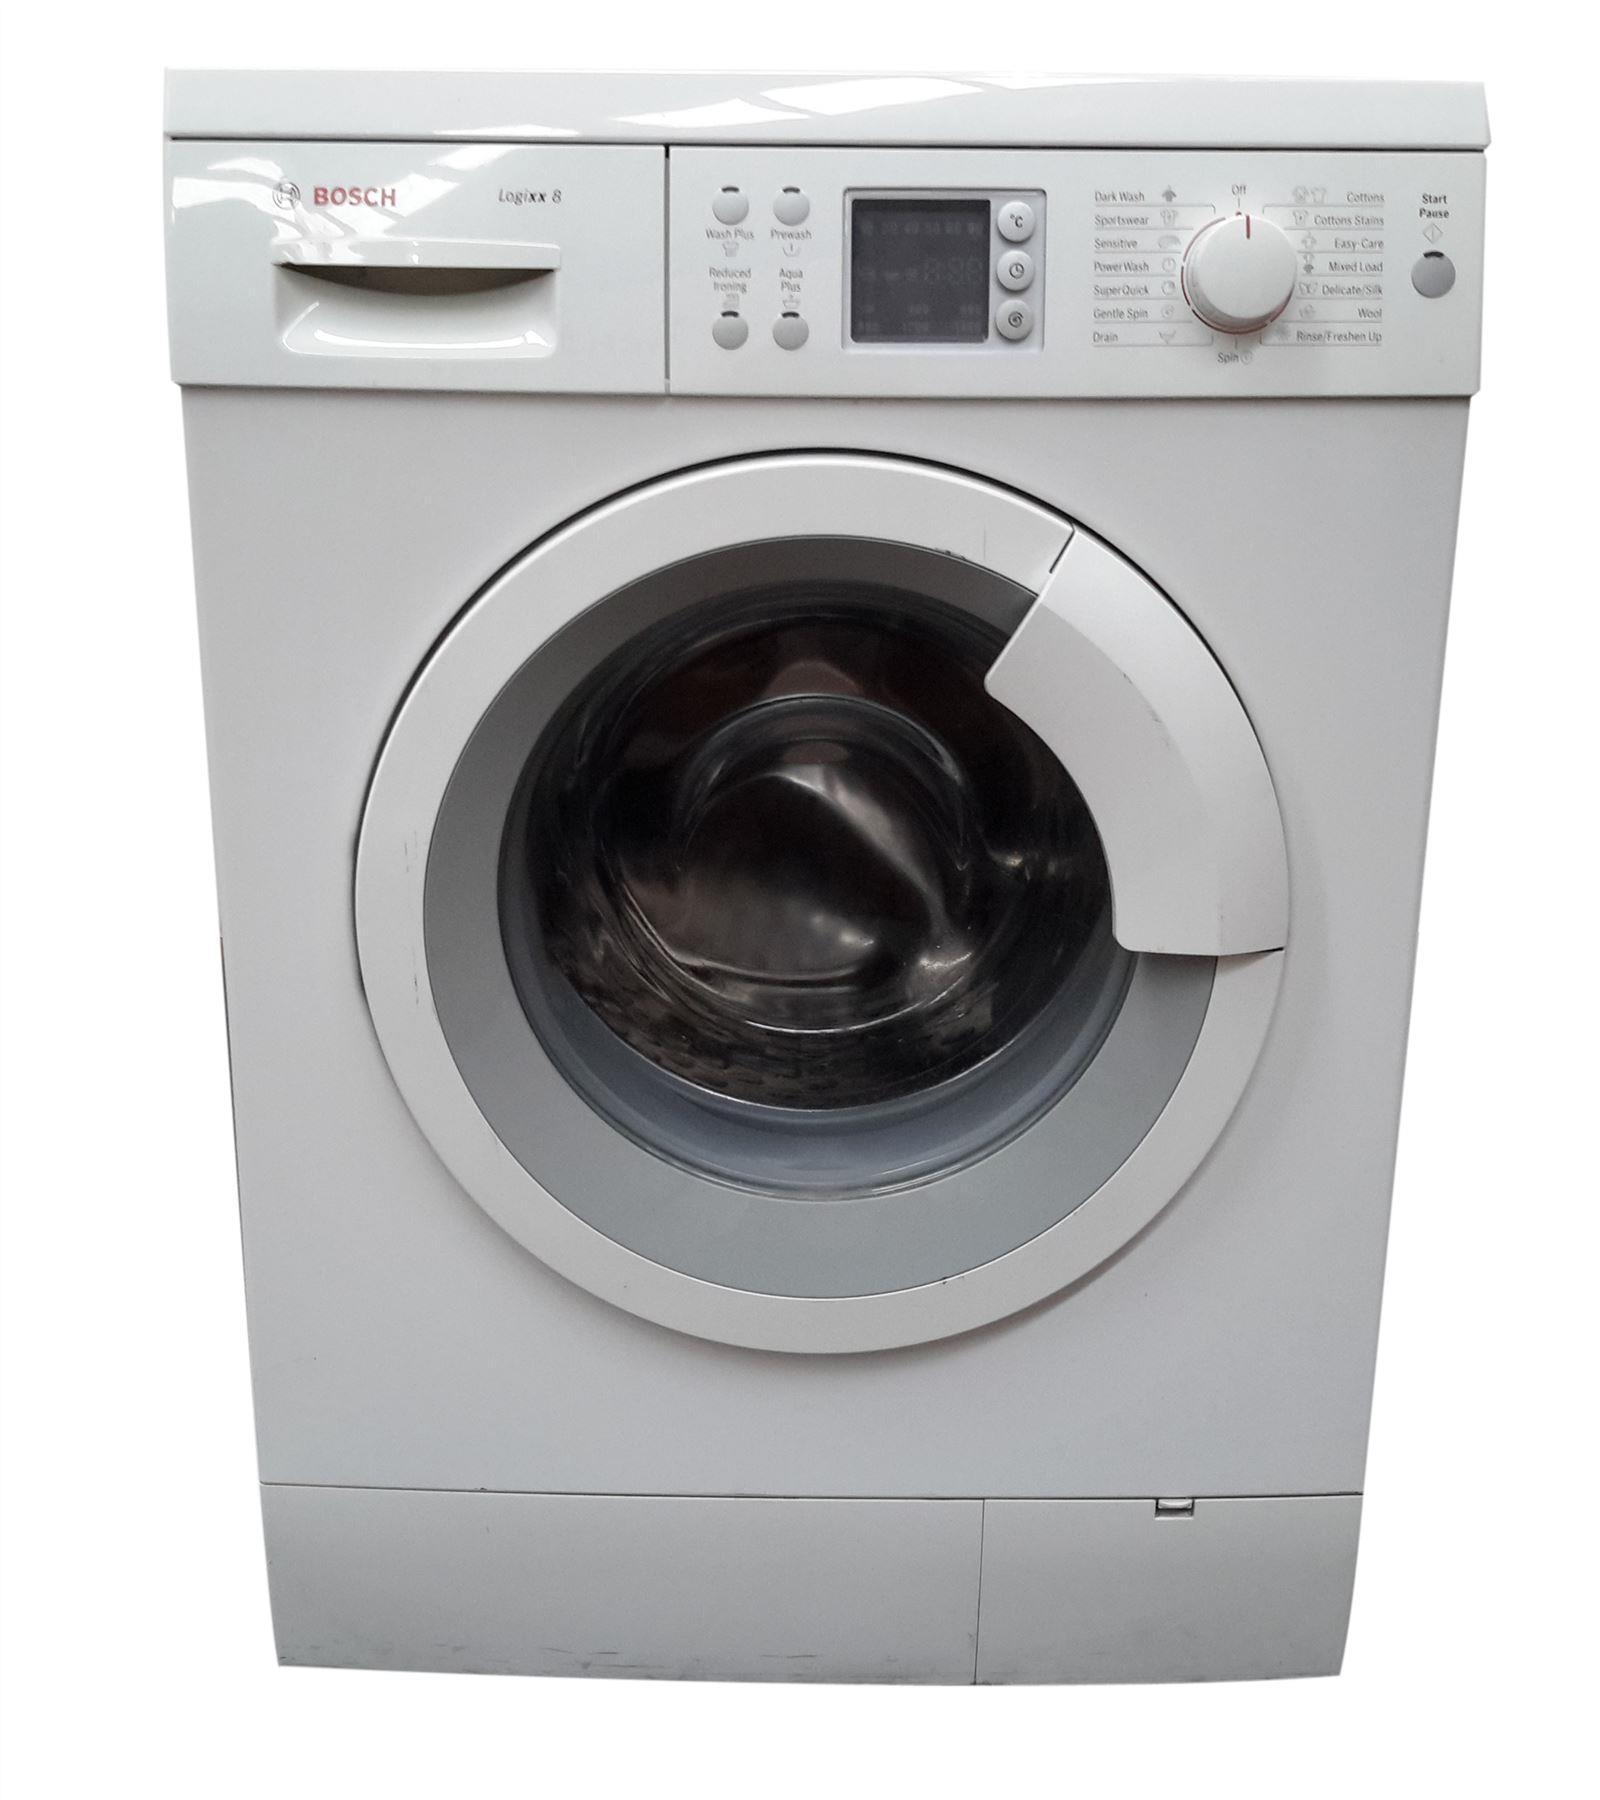 bosch was28466gb freestanding 8kg capacity washing machine. Black Bedroom Furniture Sets. Home Design Ideas